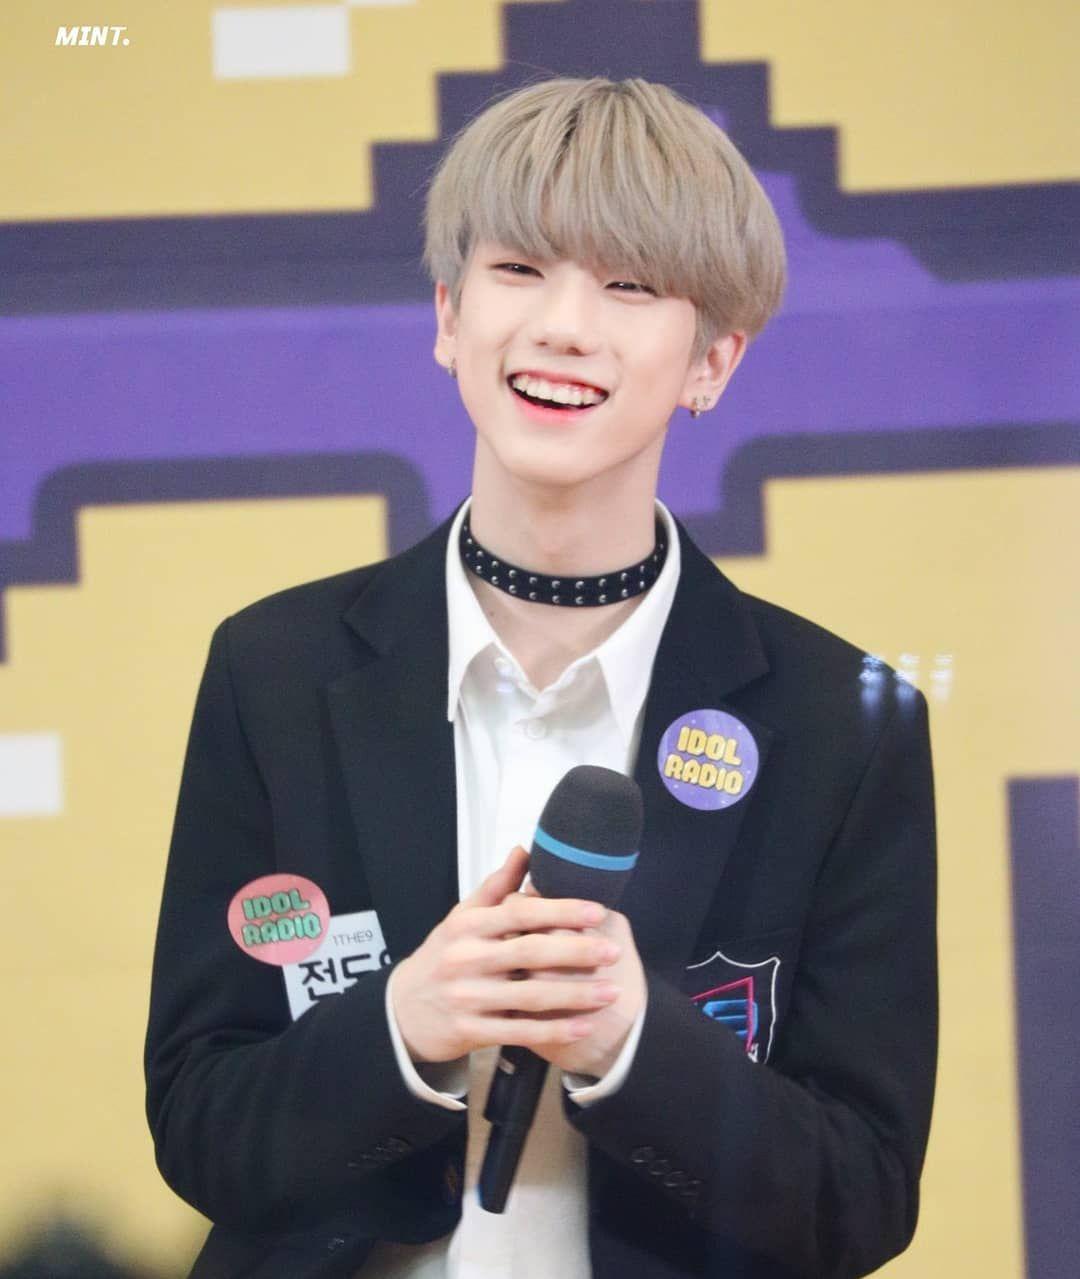 Jeon Doyum 1the9 Di Instagram Smiley Bub 1the9 On Idol Radio 190211 C Mint Follow Doyum Official And Turn On Our Post Notifi Jeon Korean Idol Korea Boy